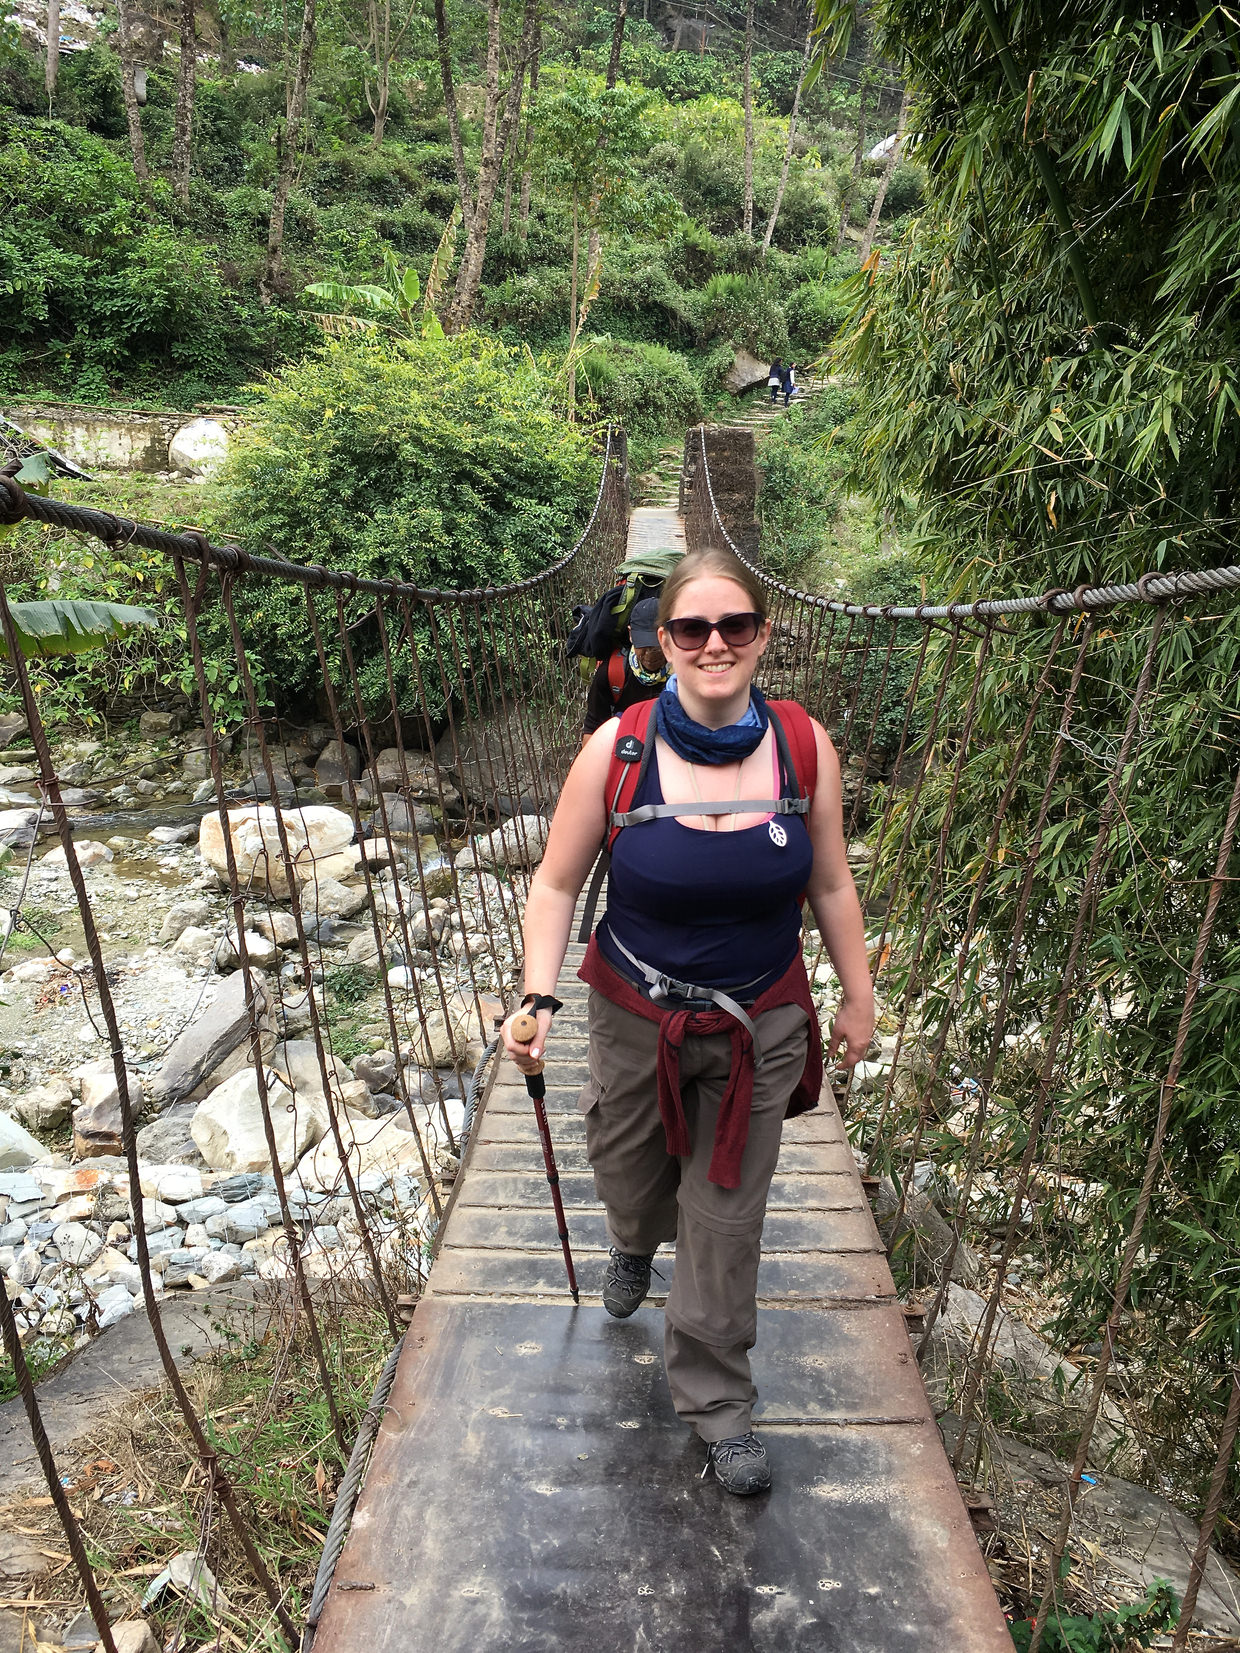 Samantha crossing the first bridge